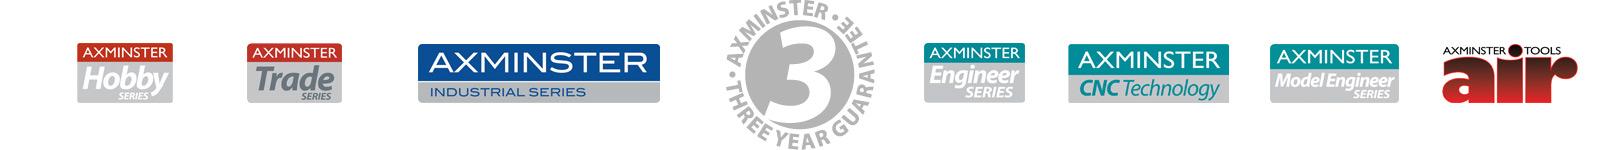 3 Year Axminster Guarantee